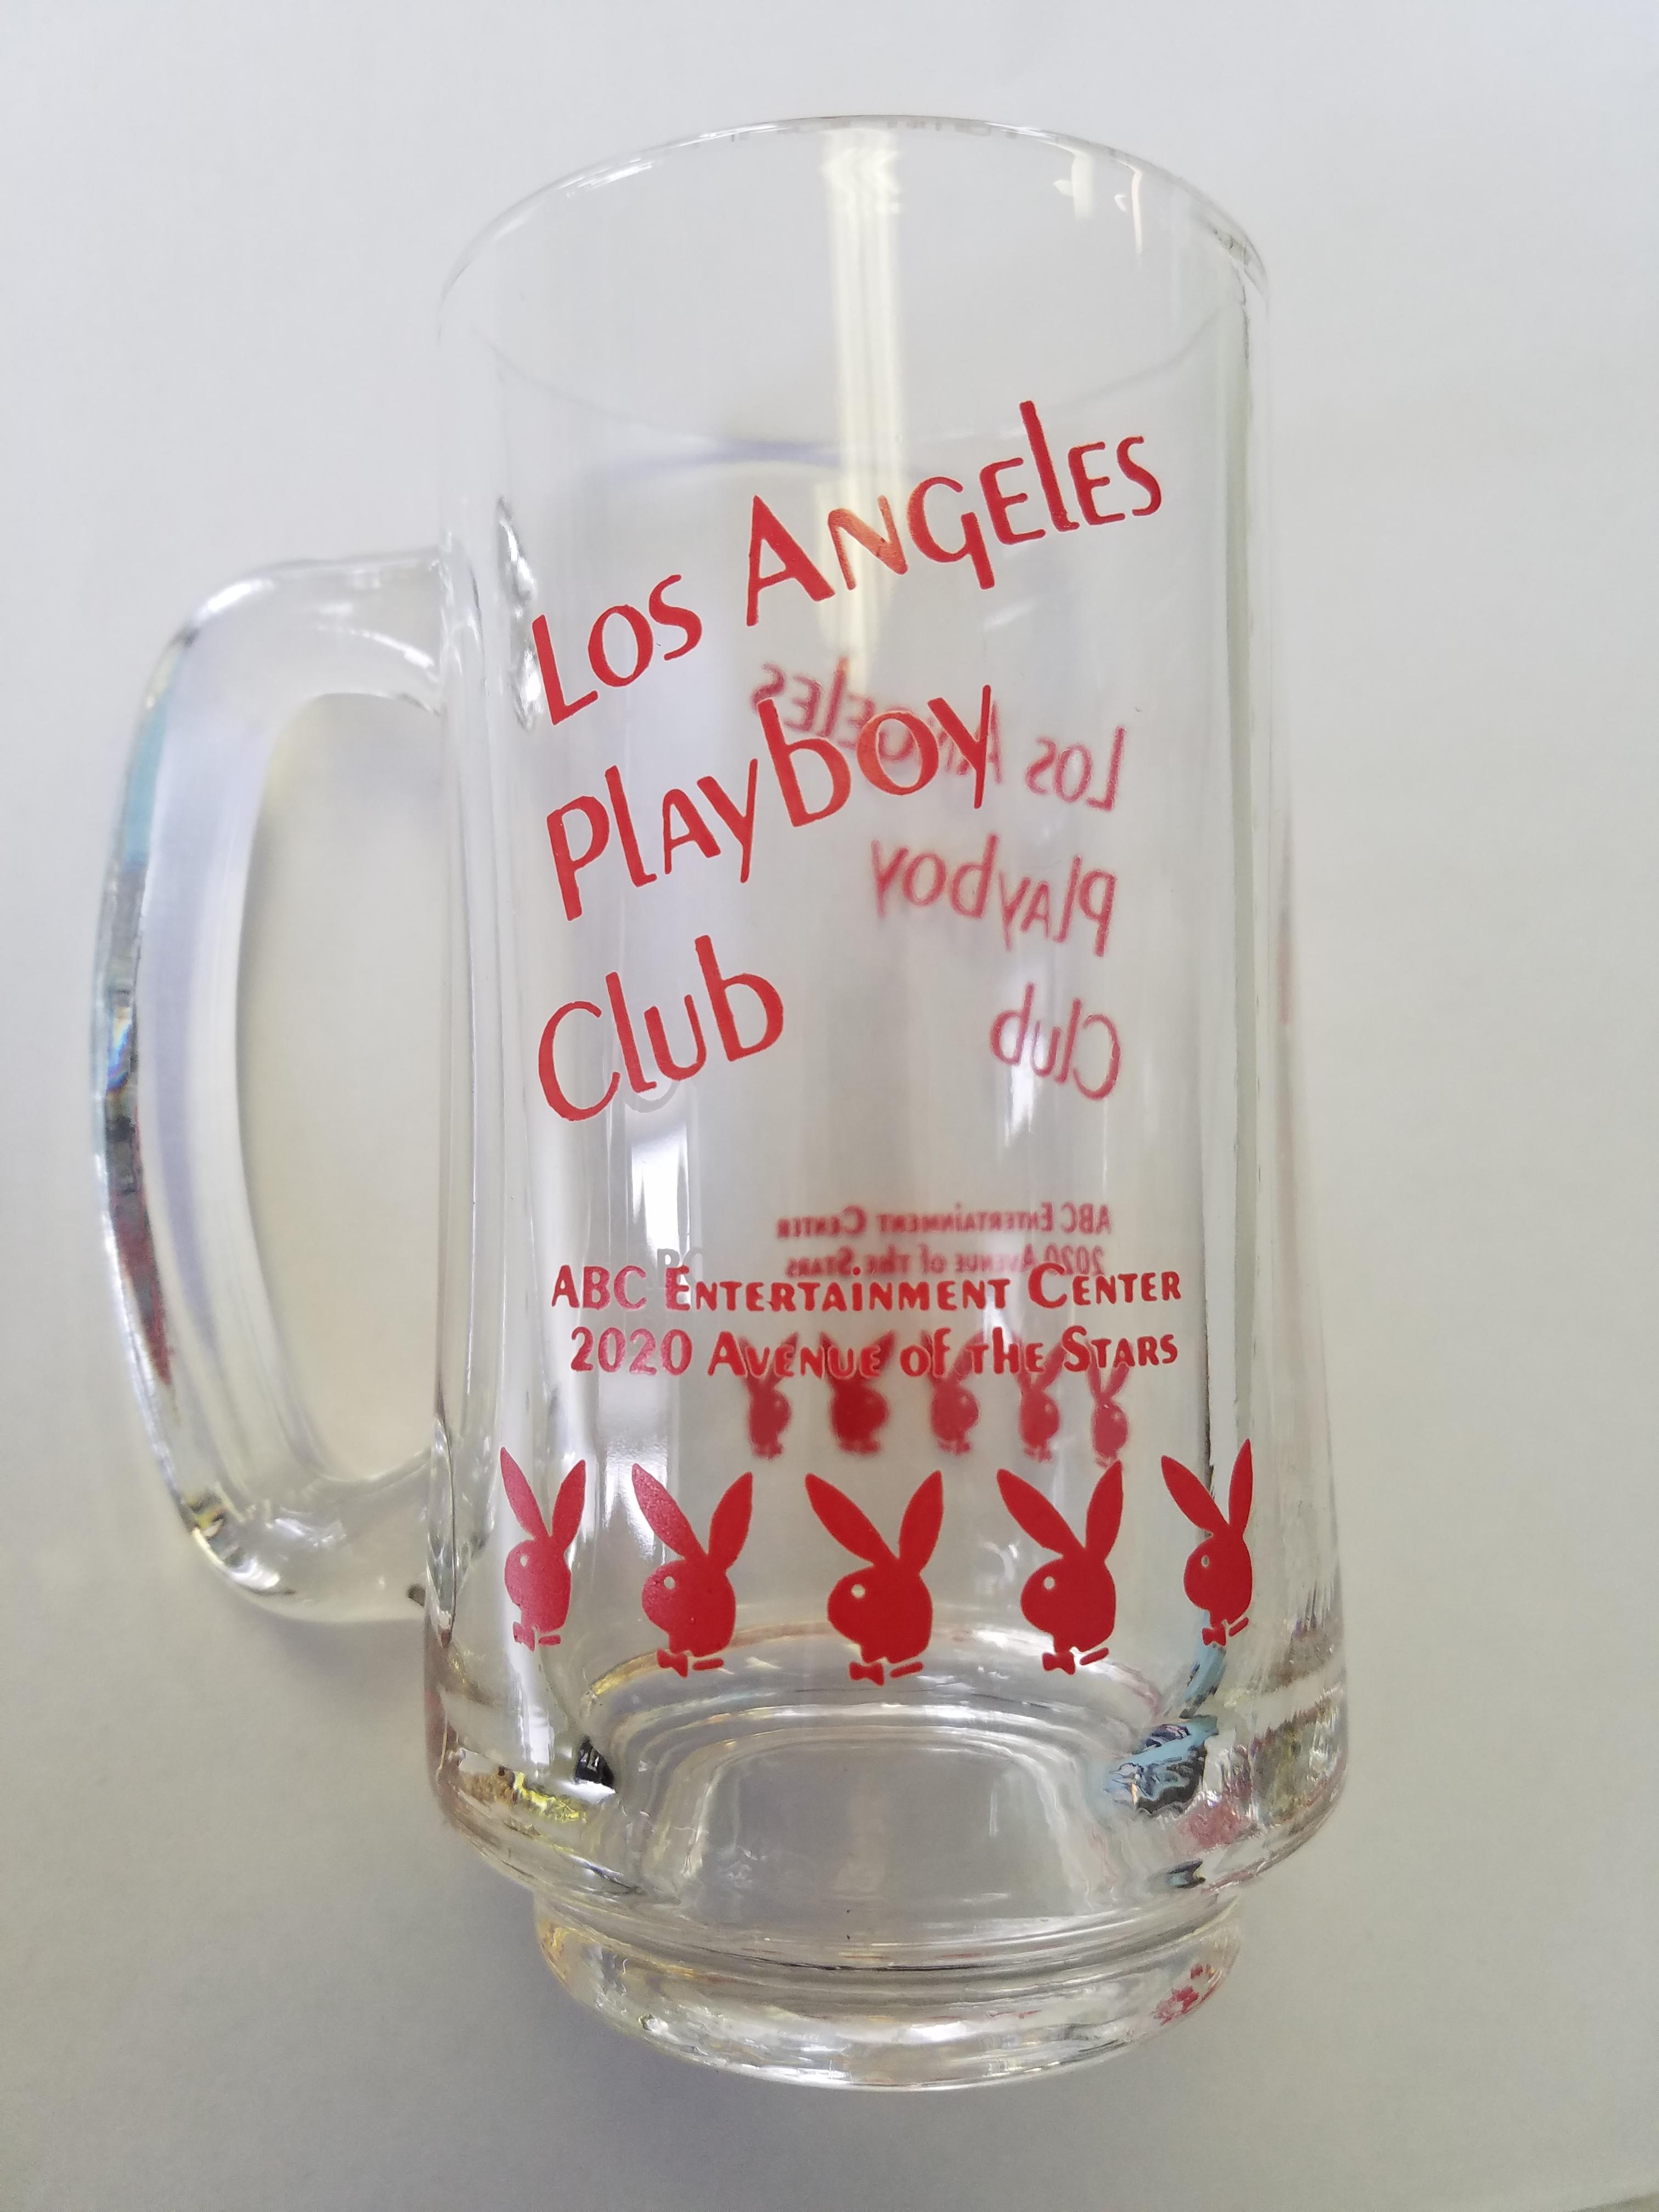 LA Los Angeles Playboy Club Red Mug